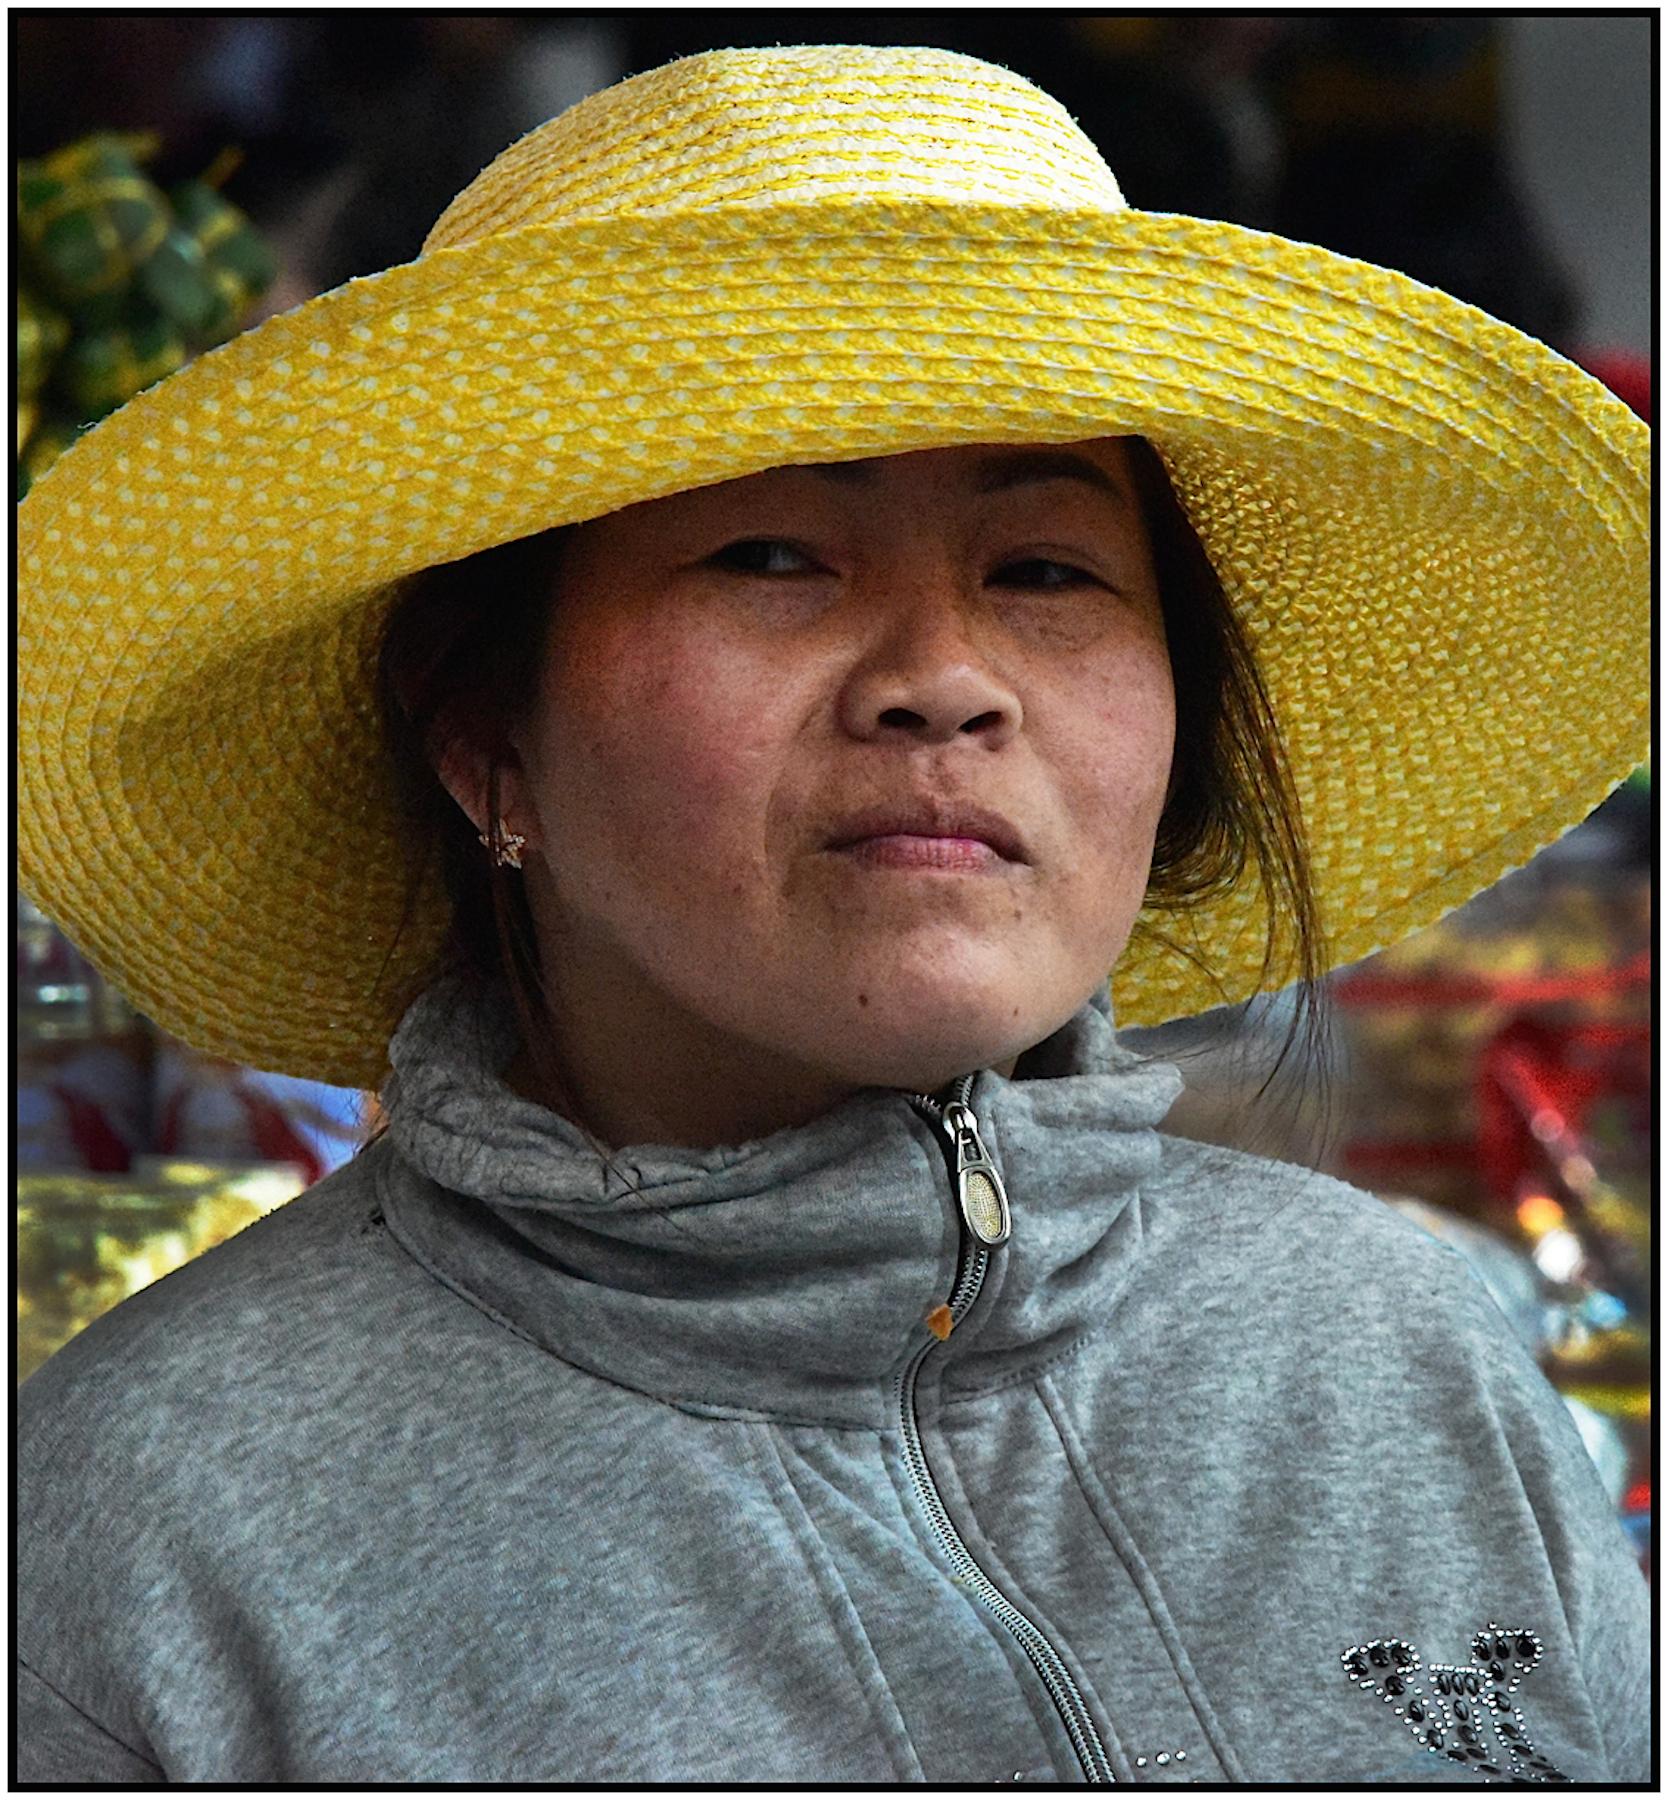 Hung Thang rest stop, Mekong Delta, Jan. 2016. #9834